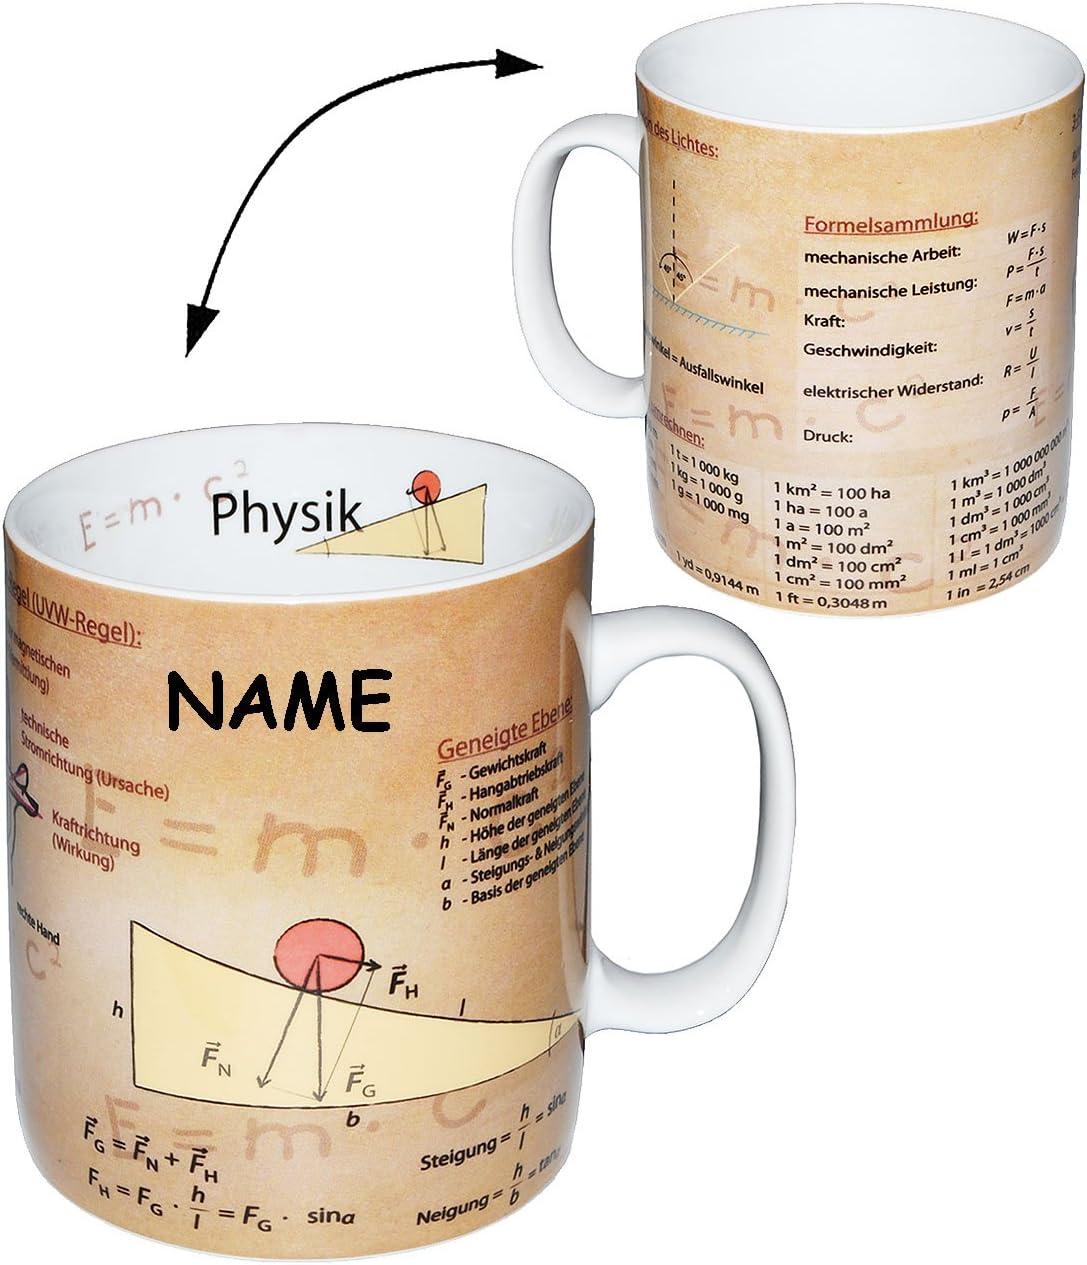 460 ml Name Kaffeetasse incl Studen.. Uni alles-meine.de GmbH Henkeltasse Mathe gro/ß Schule Daten /& Fakten Porzellan // Keramik Hochschule Abitur Physik